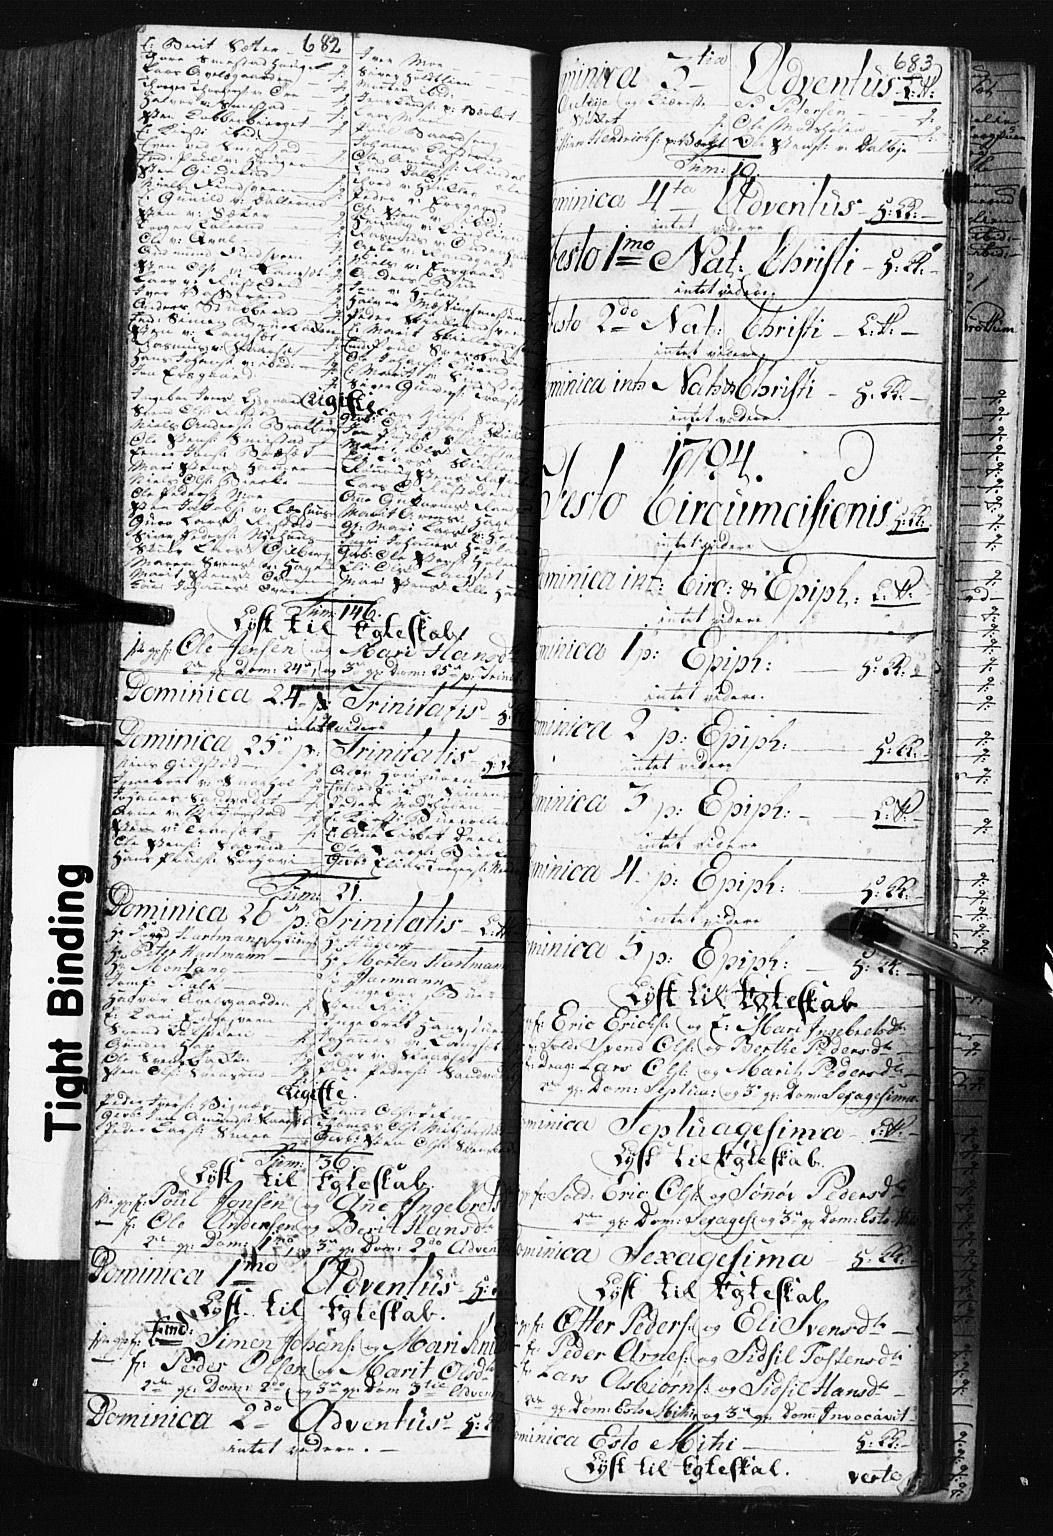 SAH, Fåberg prestekontor, Klokkerbok nr. 3, 1768-1796, s. 682-683